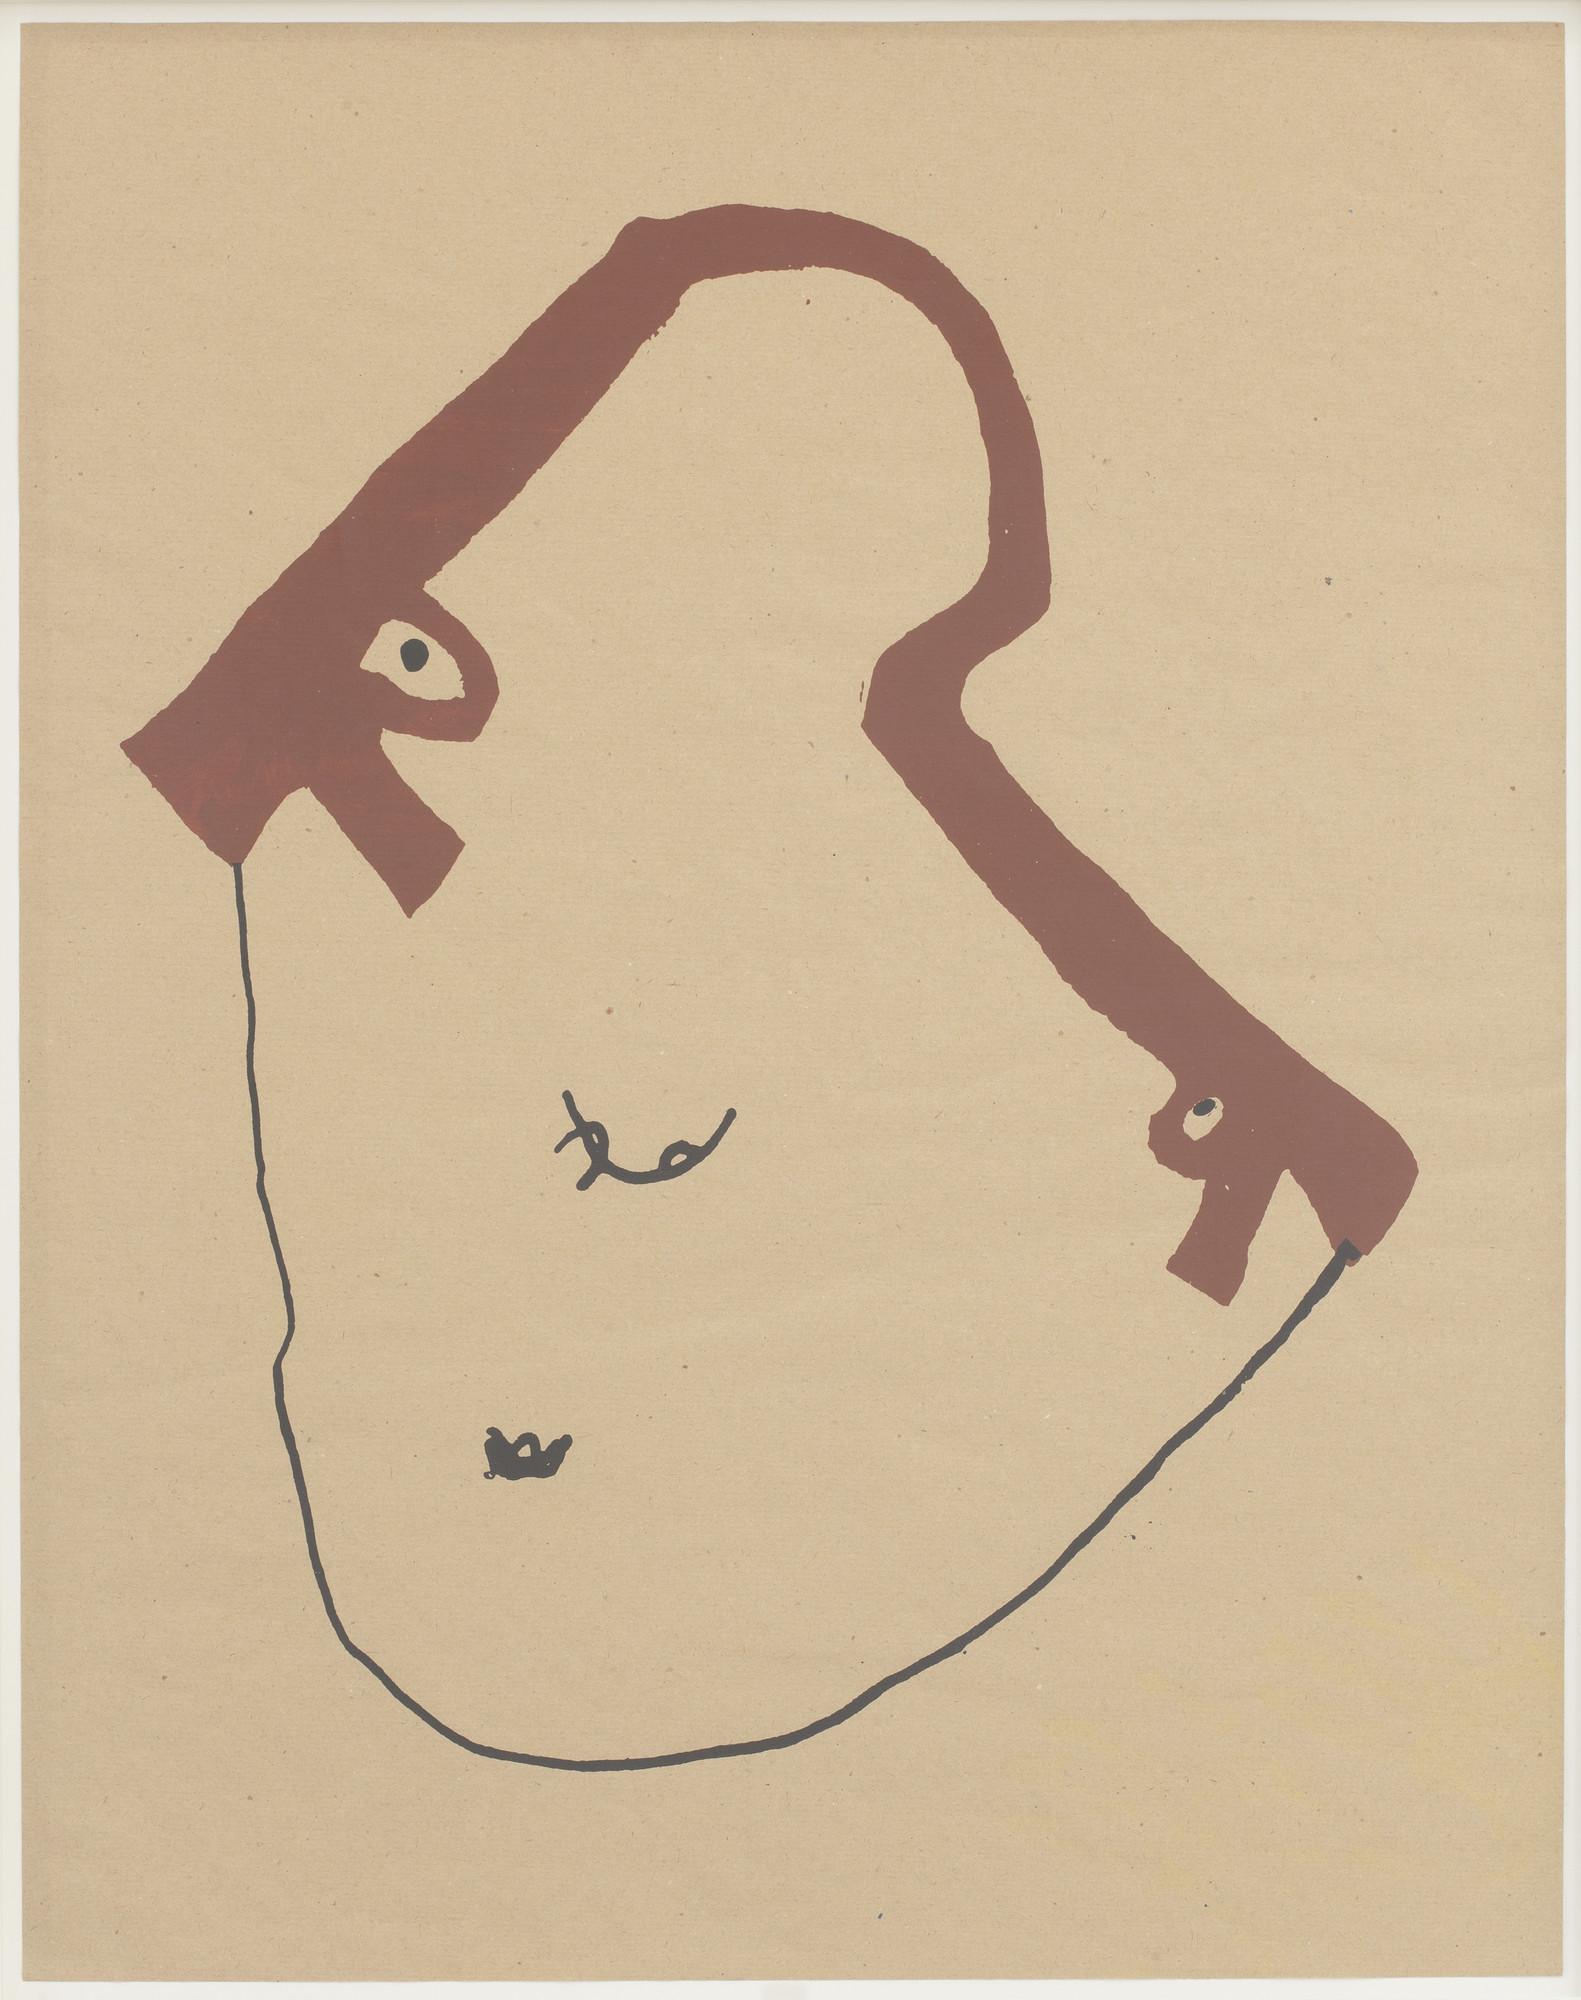 Walter Dahn. Gun Face. 1985 | MoMA